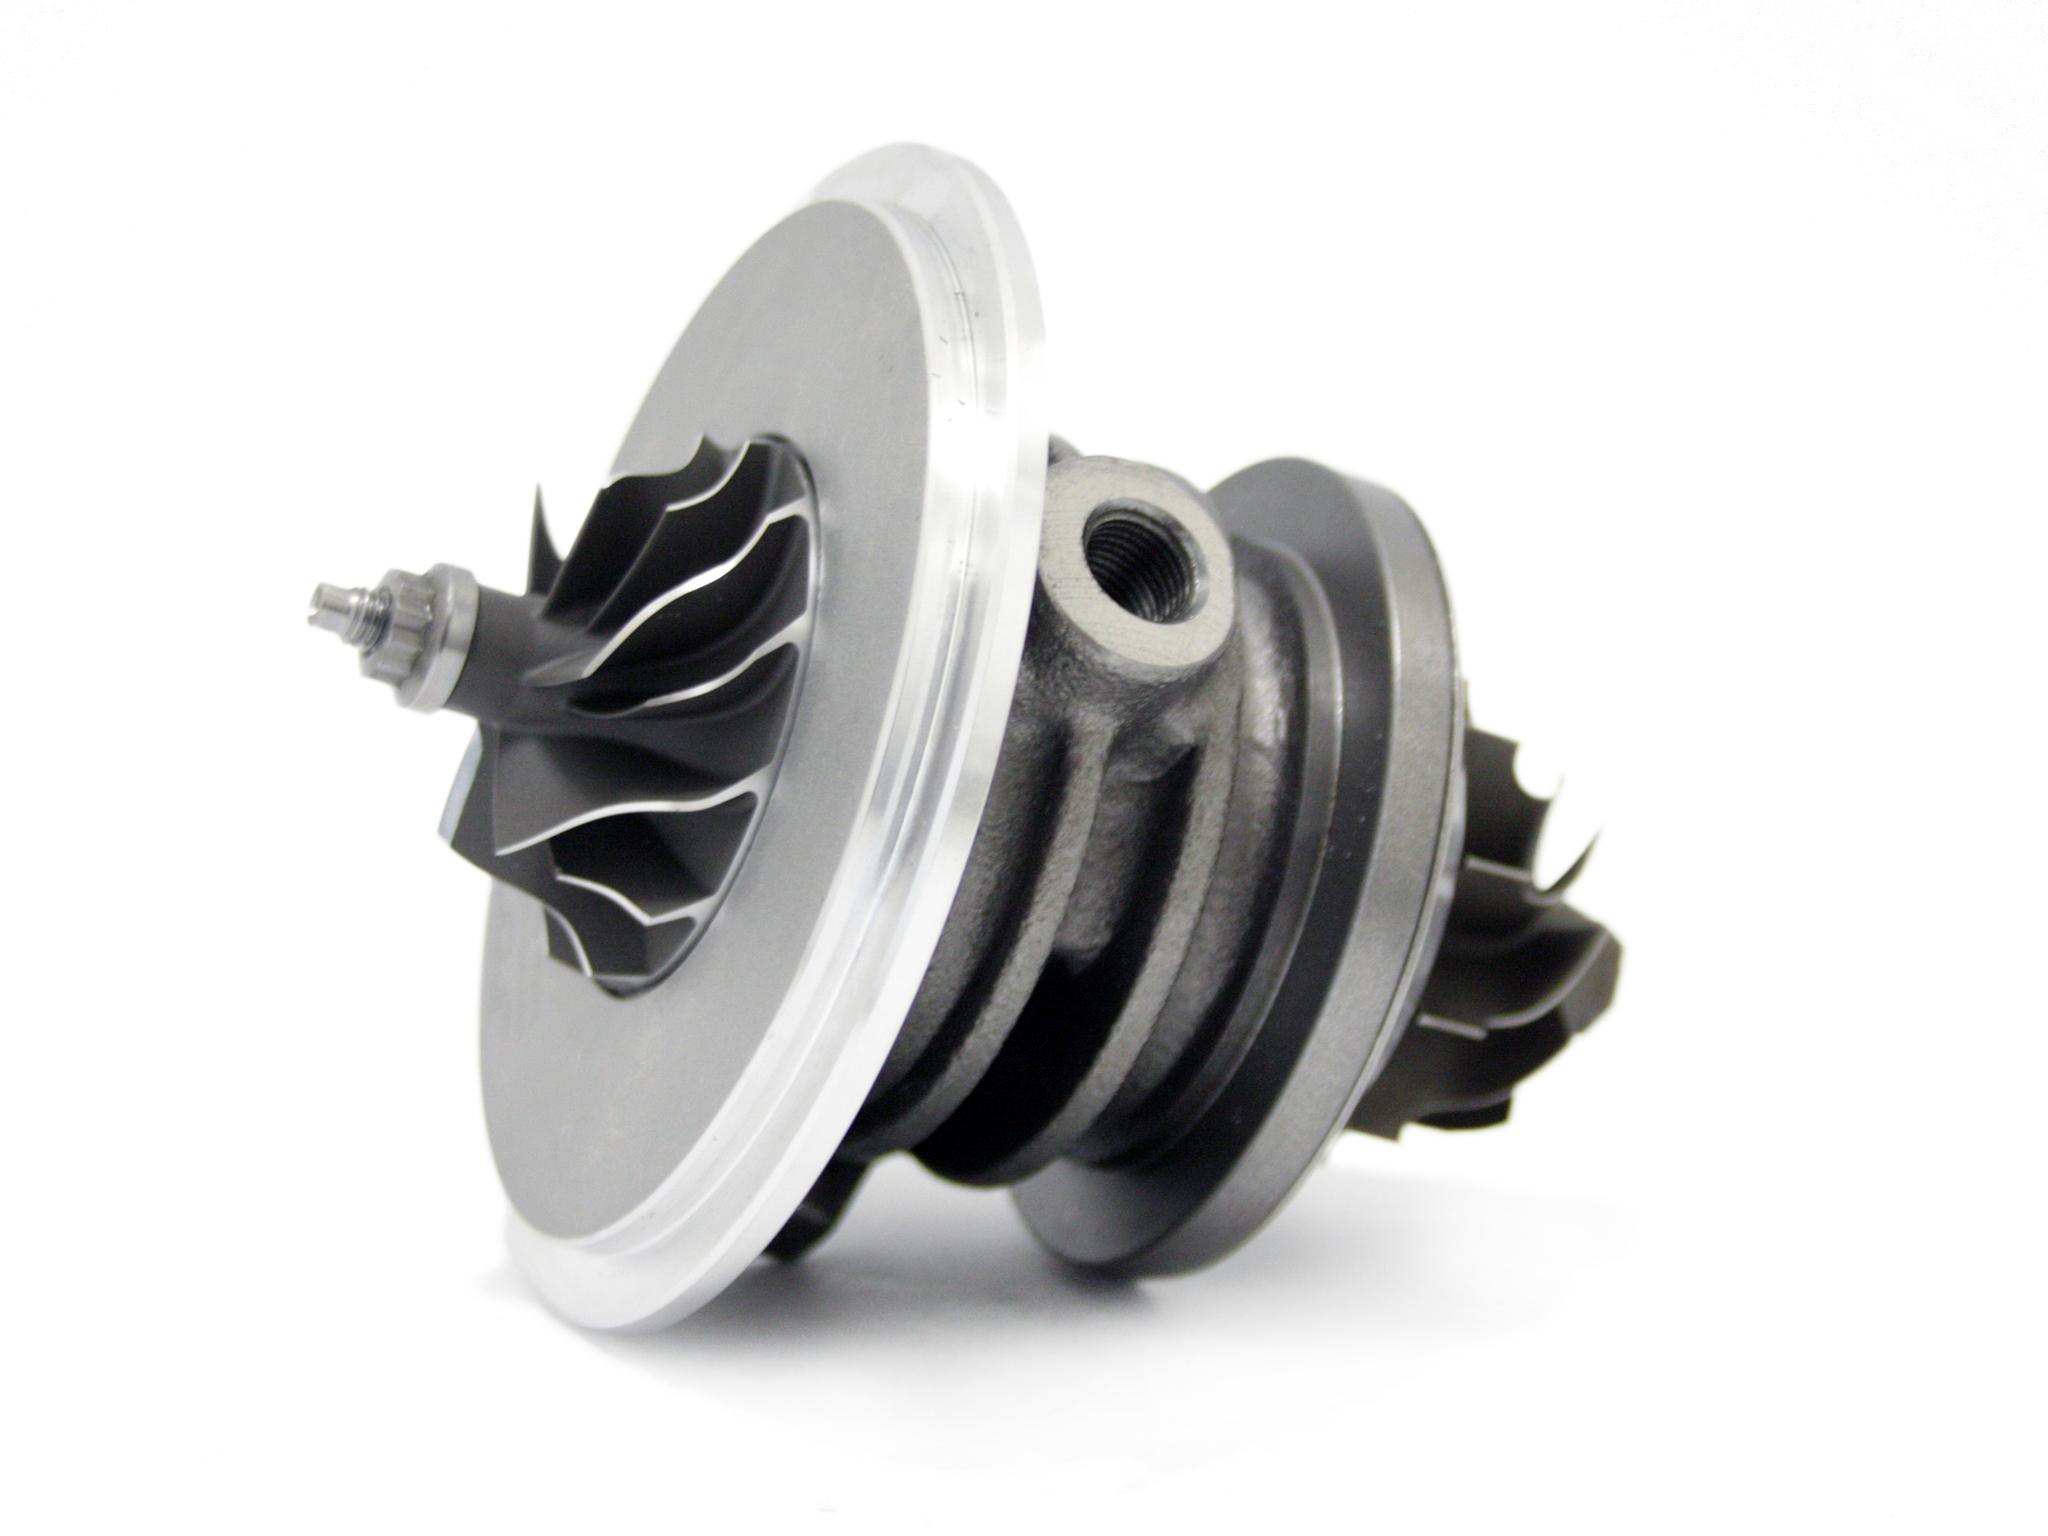 Картридж турбины GT1544 БМВ 318 TDS (E36) 1,9 M41 90 л.с.